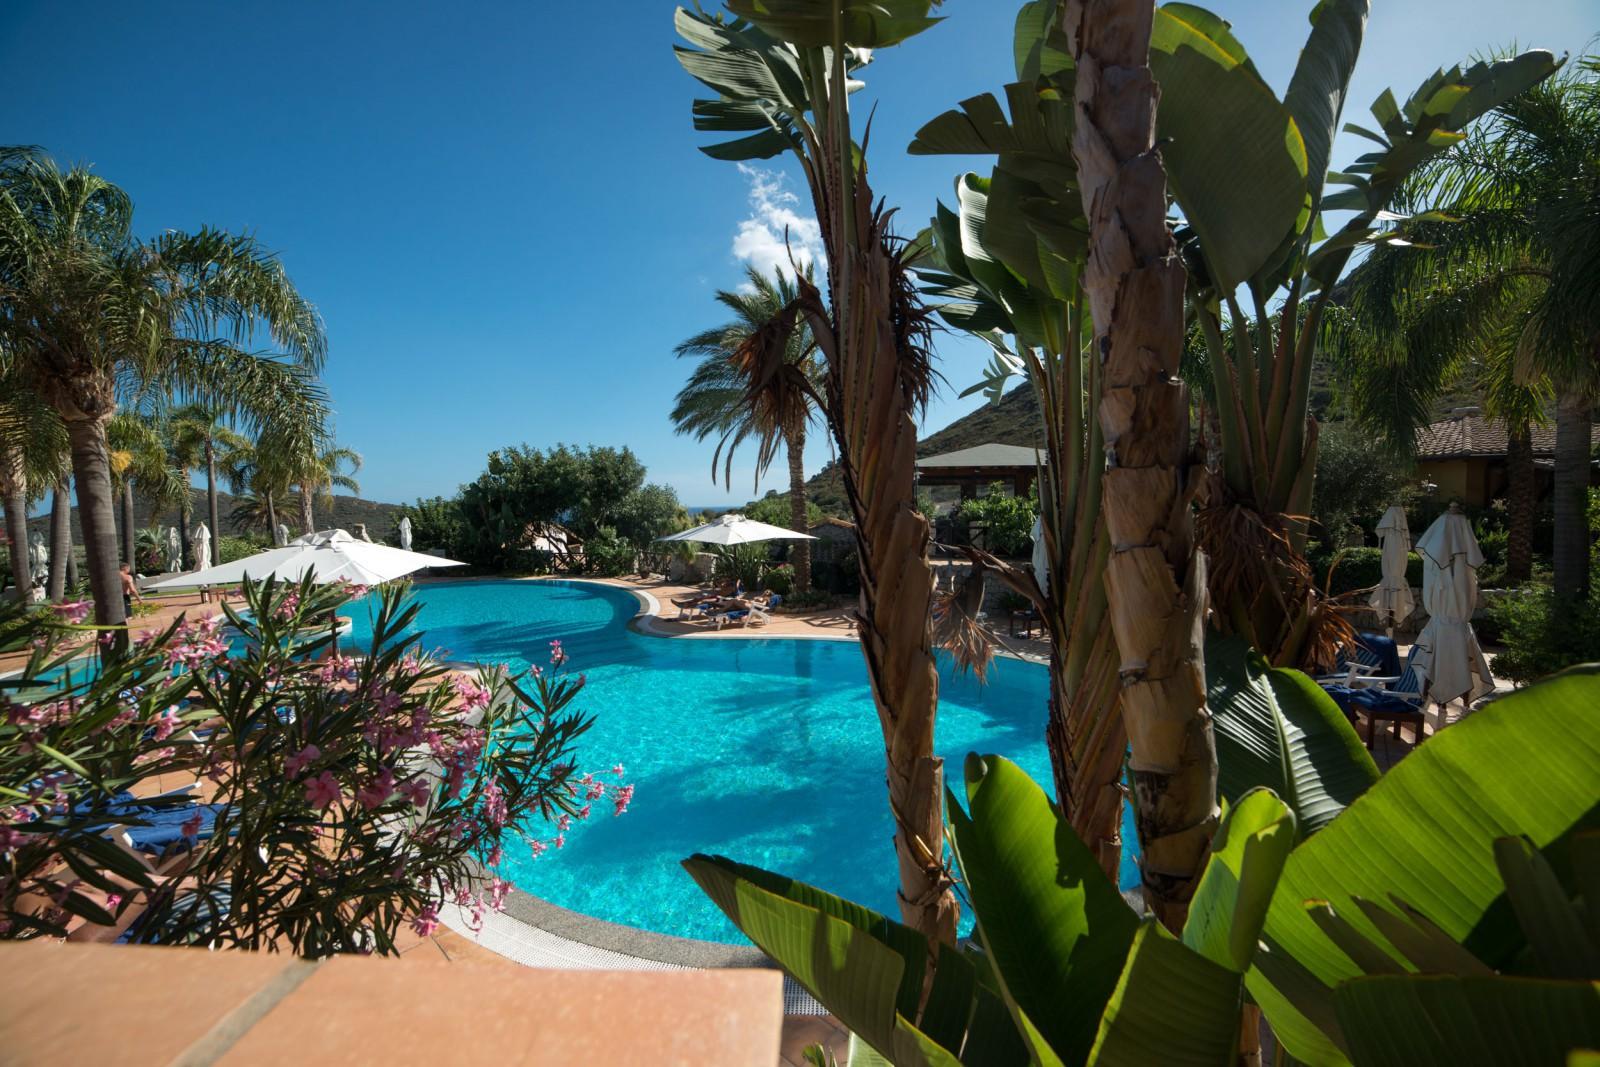 33 room resort with pool in tropical Phuket Island